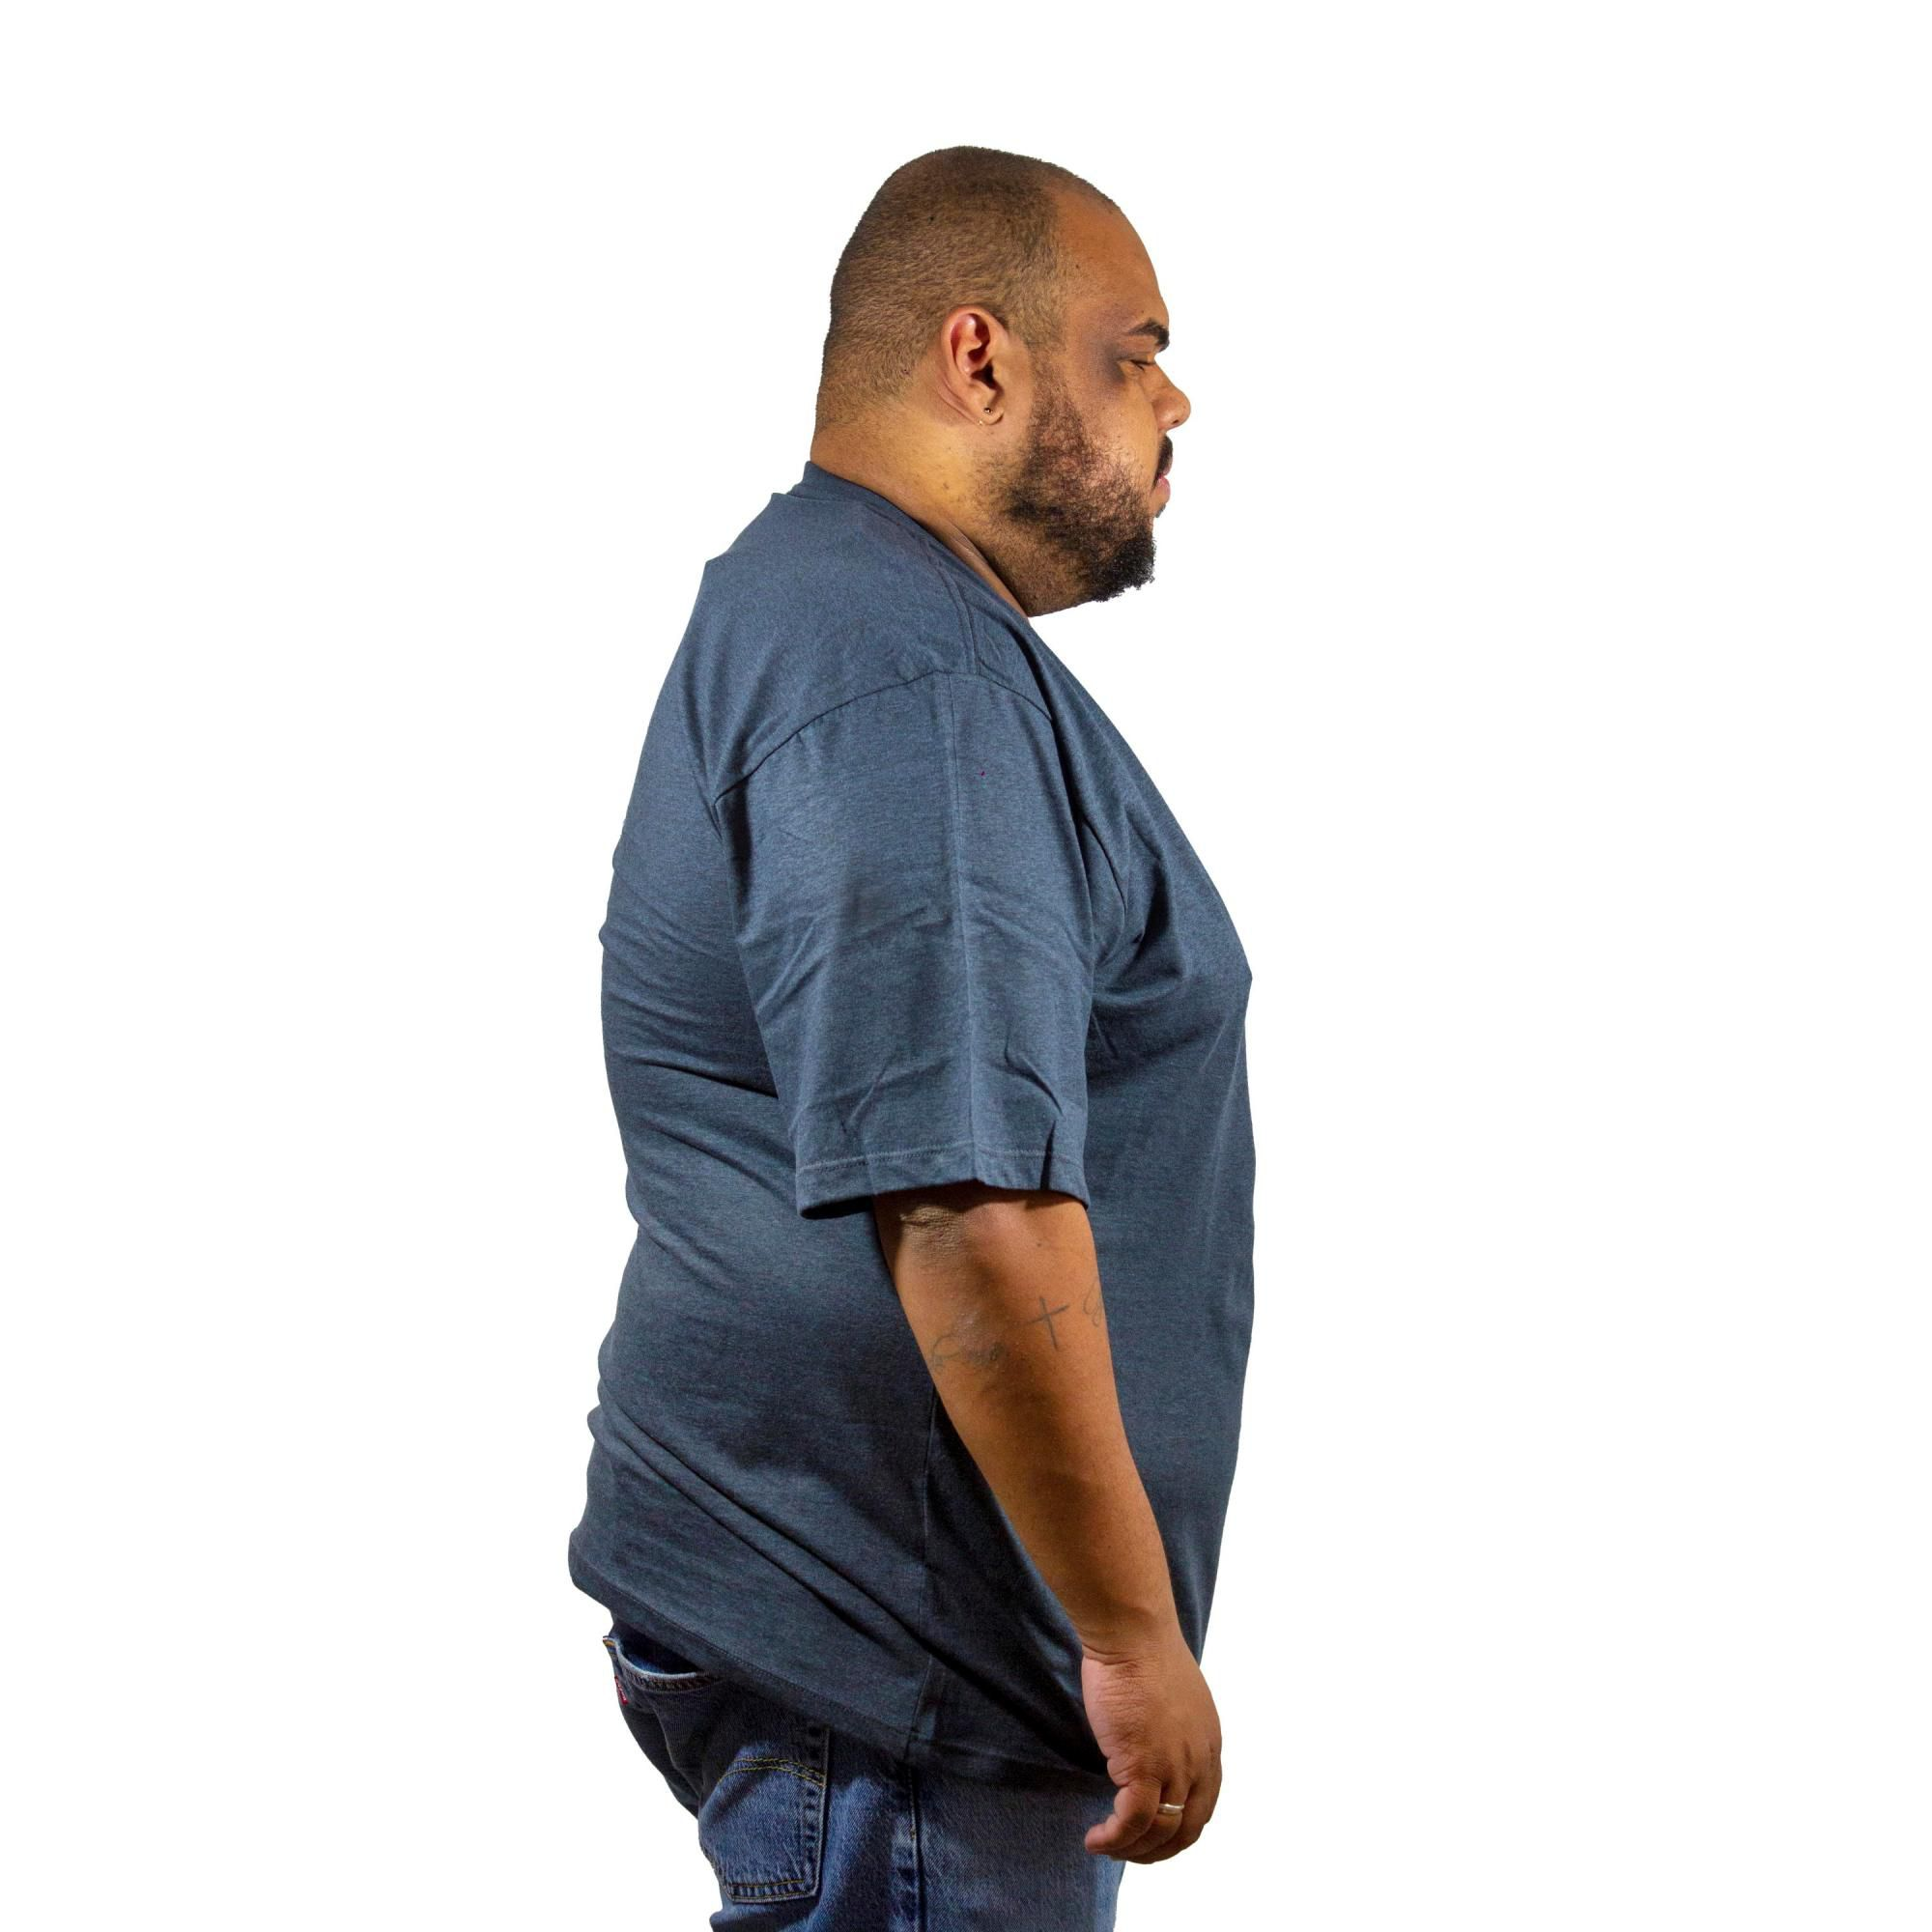 Camiseta Hurley Silk Plus Size Mescla Escuro